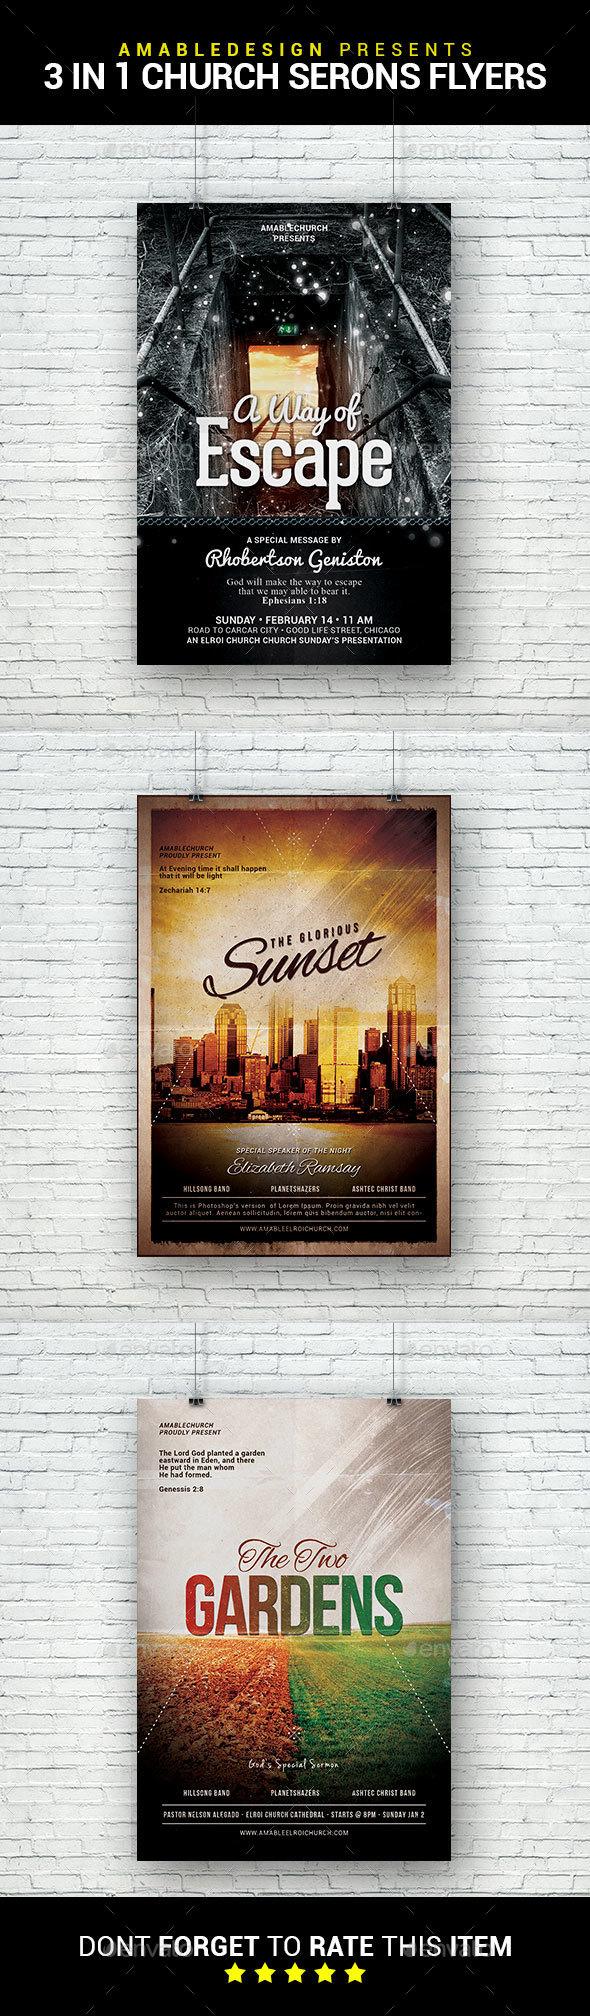 3 in 1 Church Sermons Flyer/Poster Bundle - Church Flyers